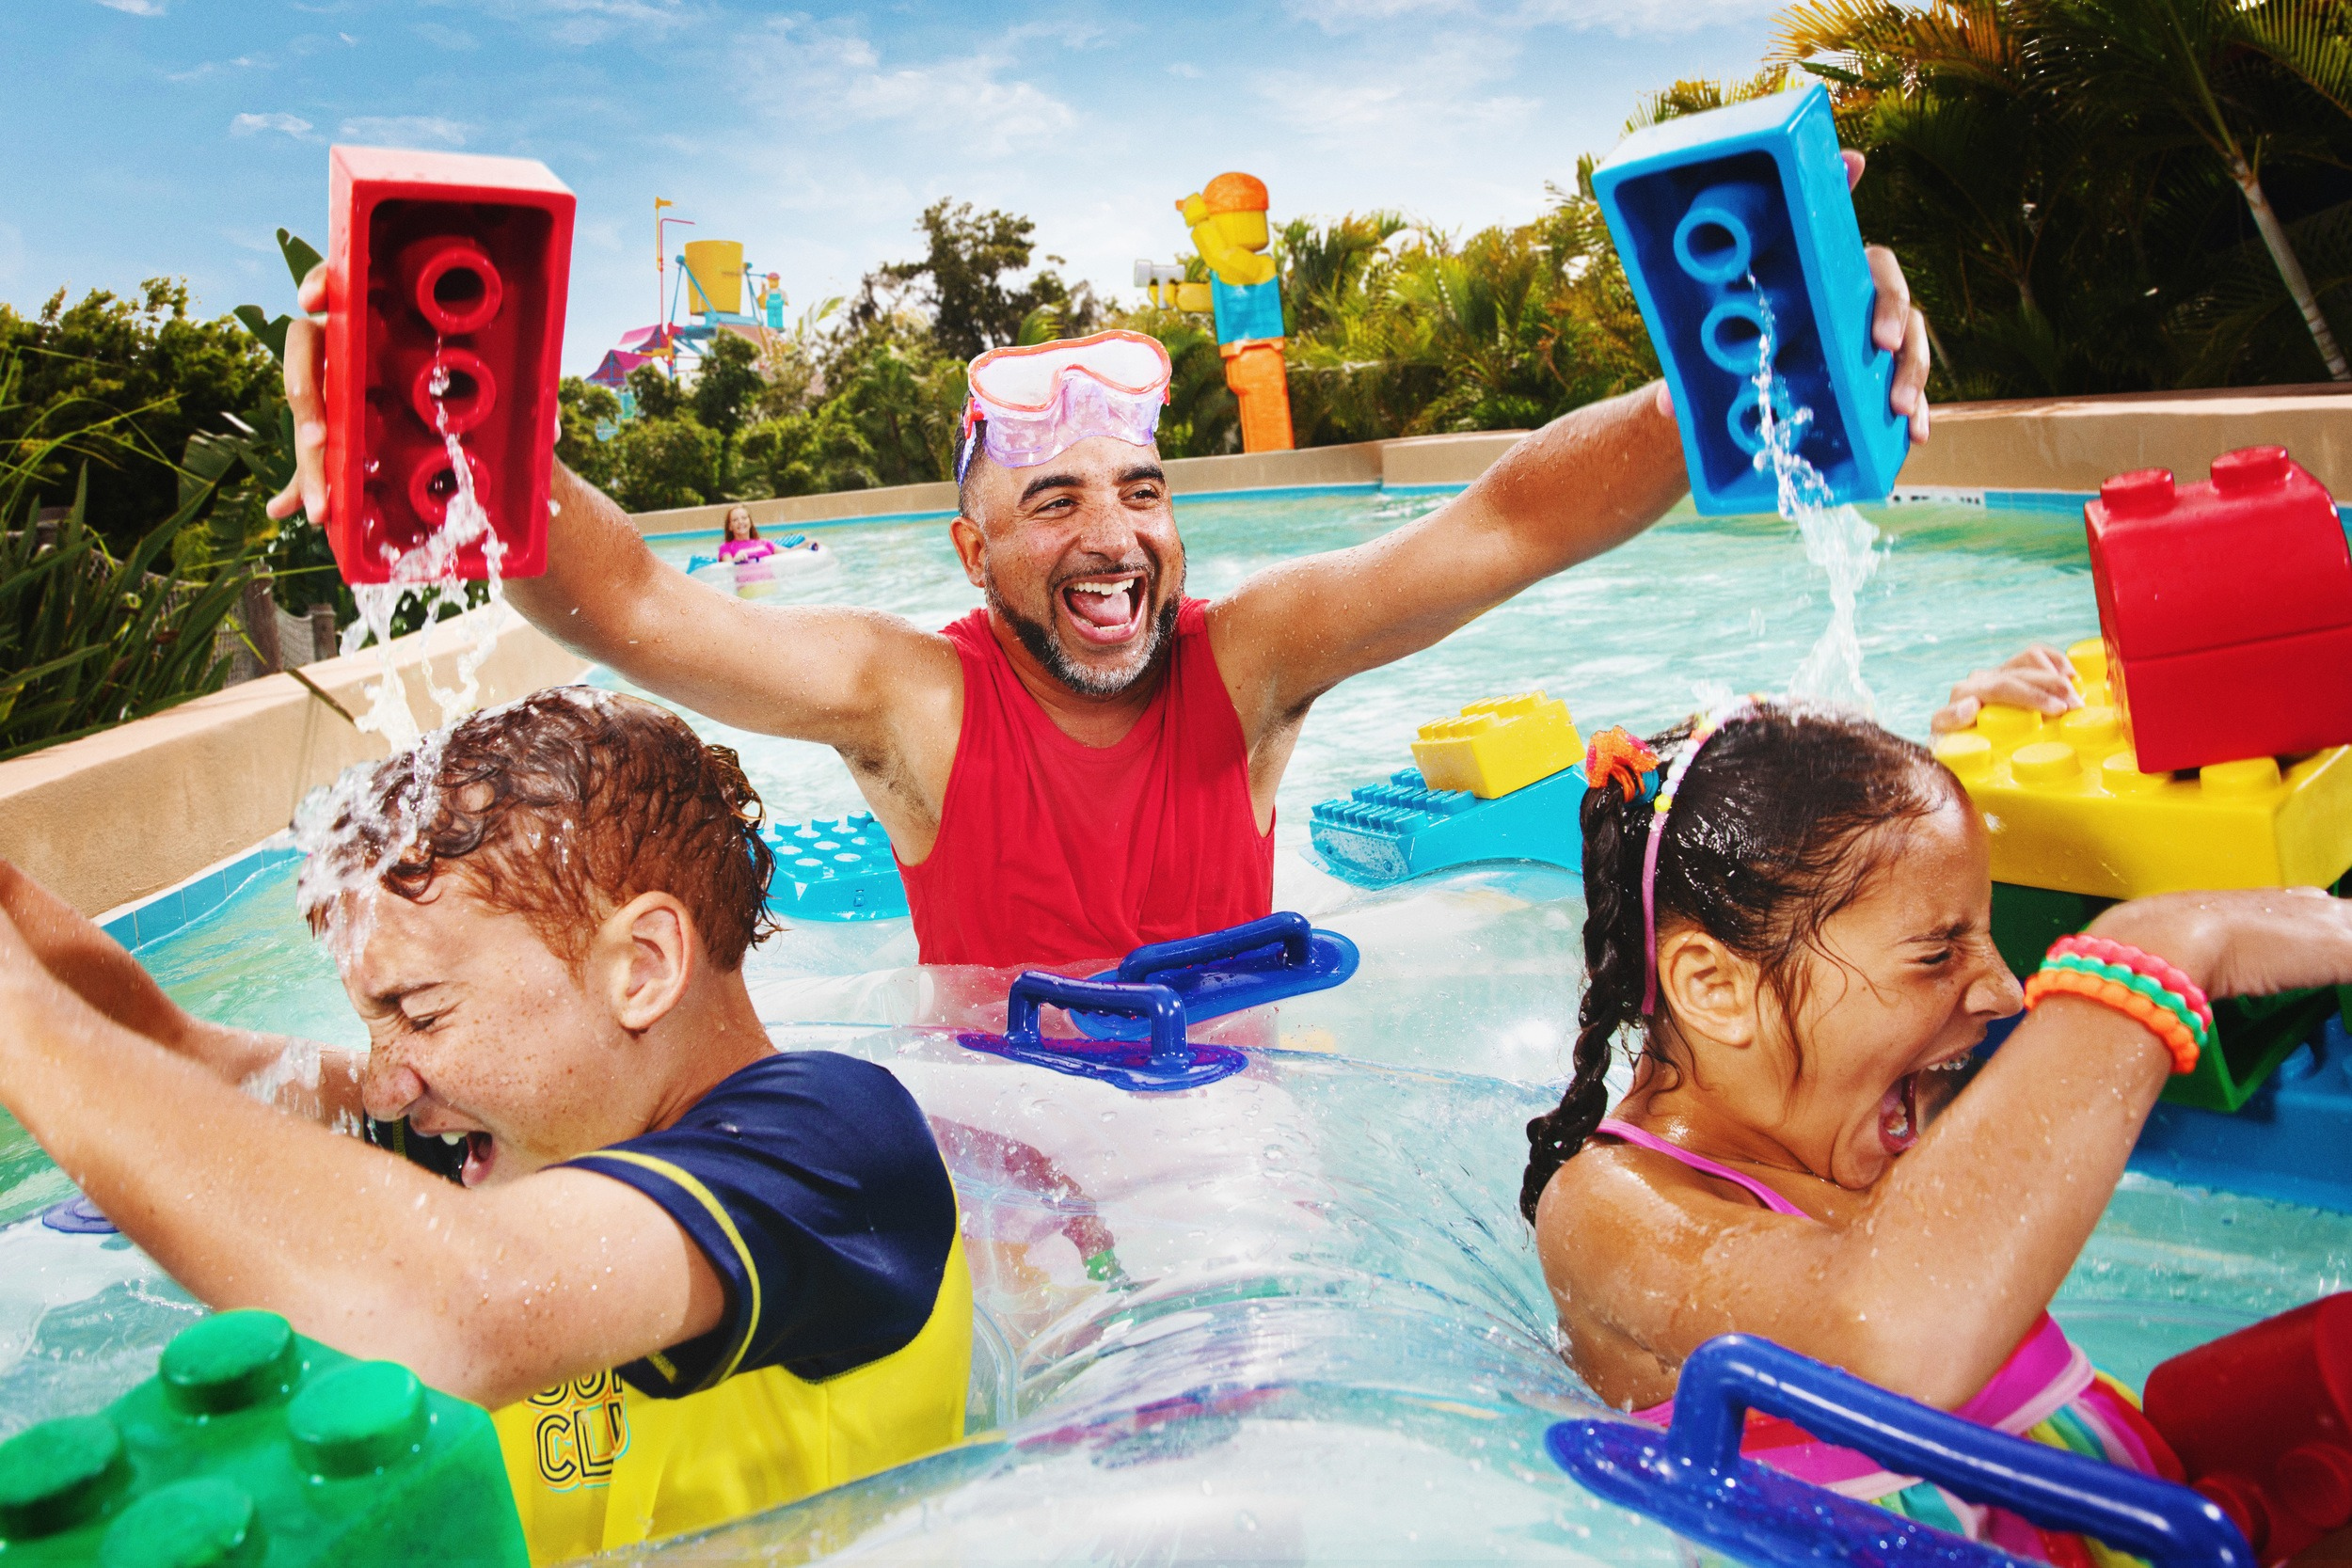 Build-A-Raft Lazy River at Legoland Florida Water Park